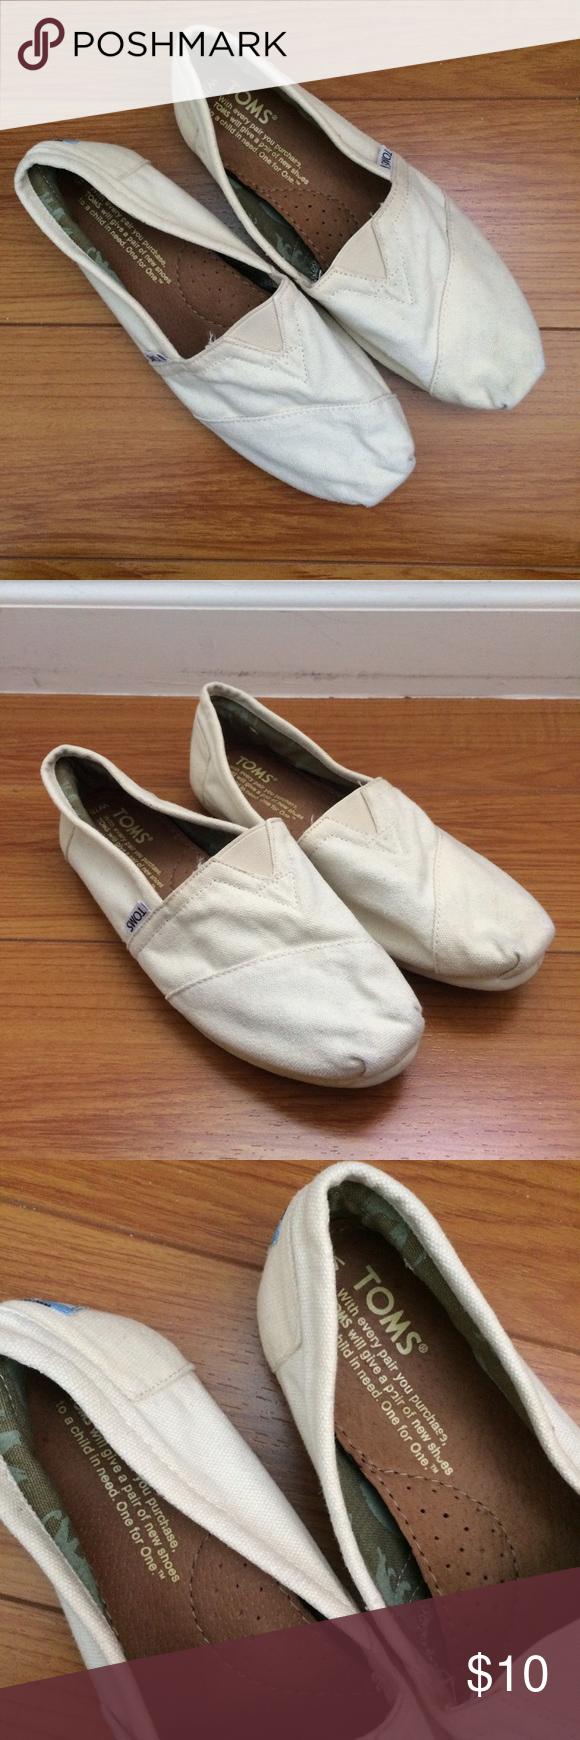 Cream color Toms ~cream colored Toms, size 7.5 TOMS Shoes